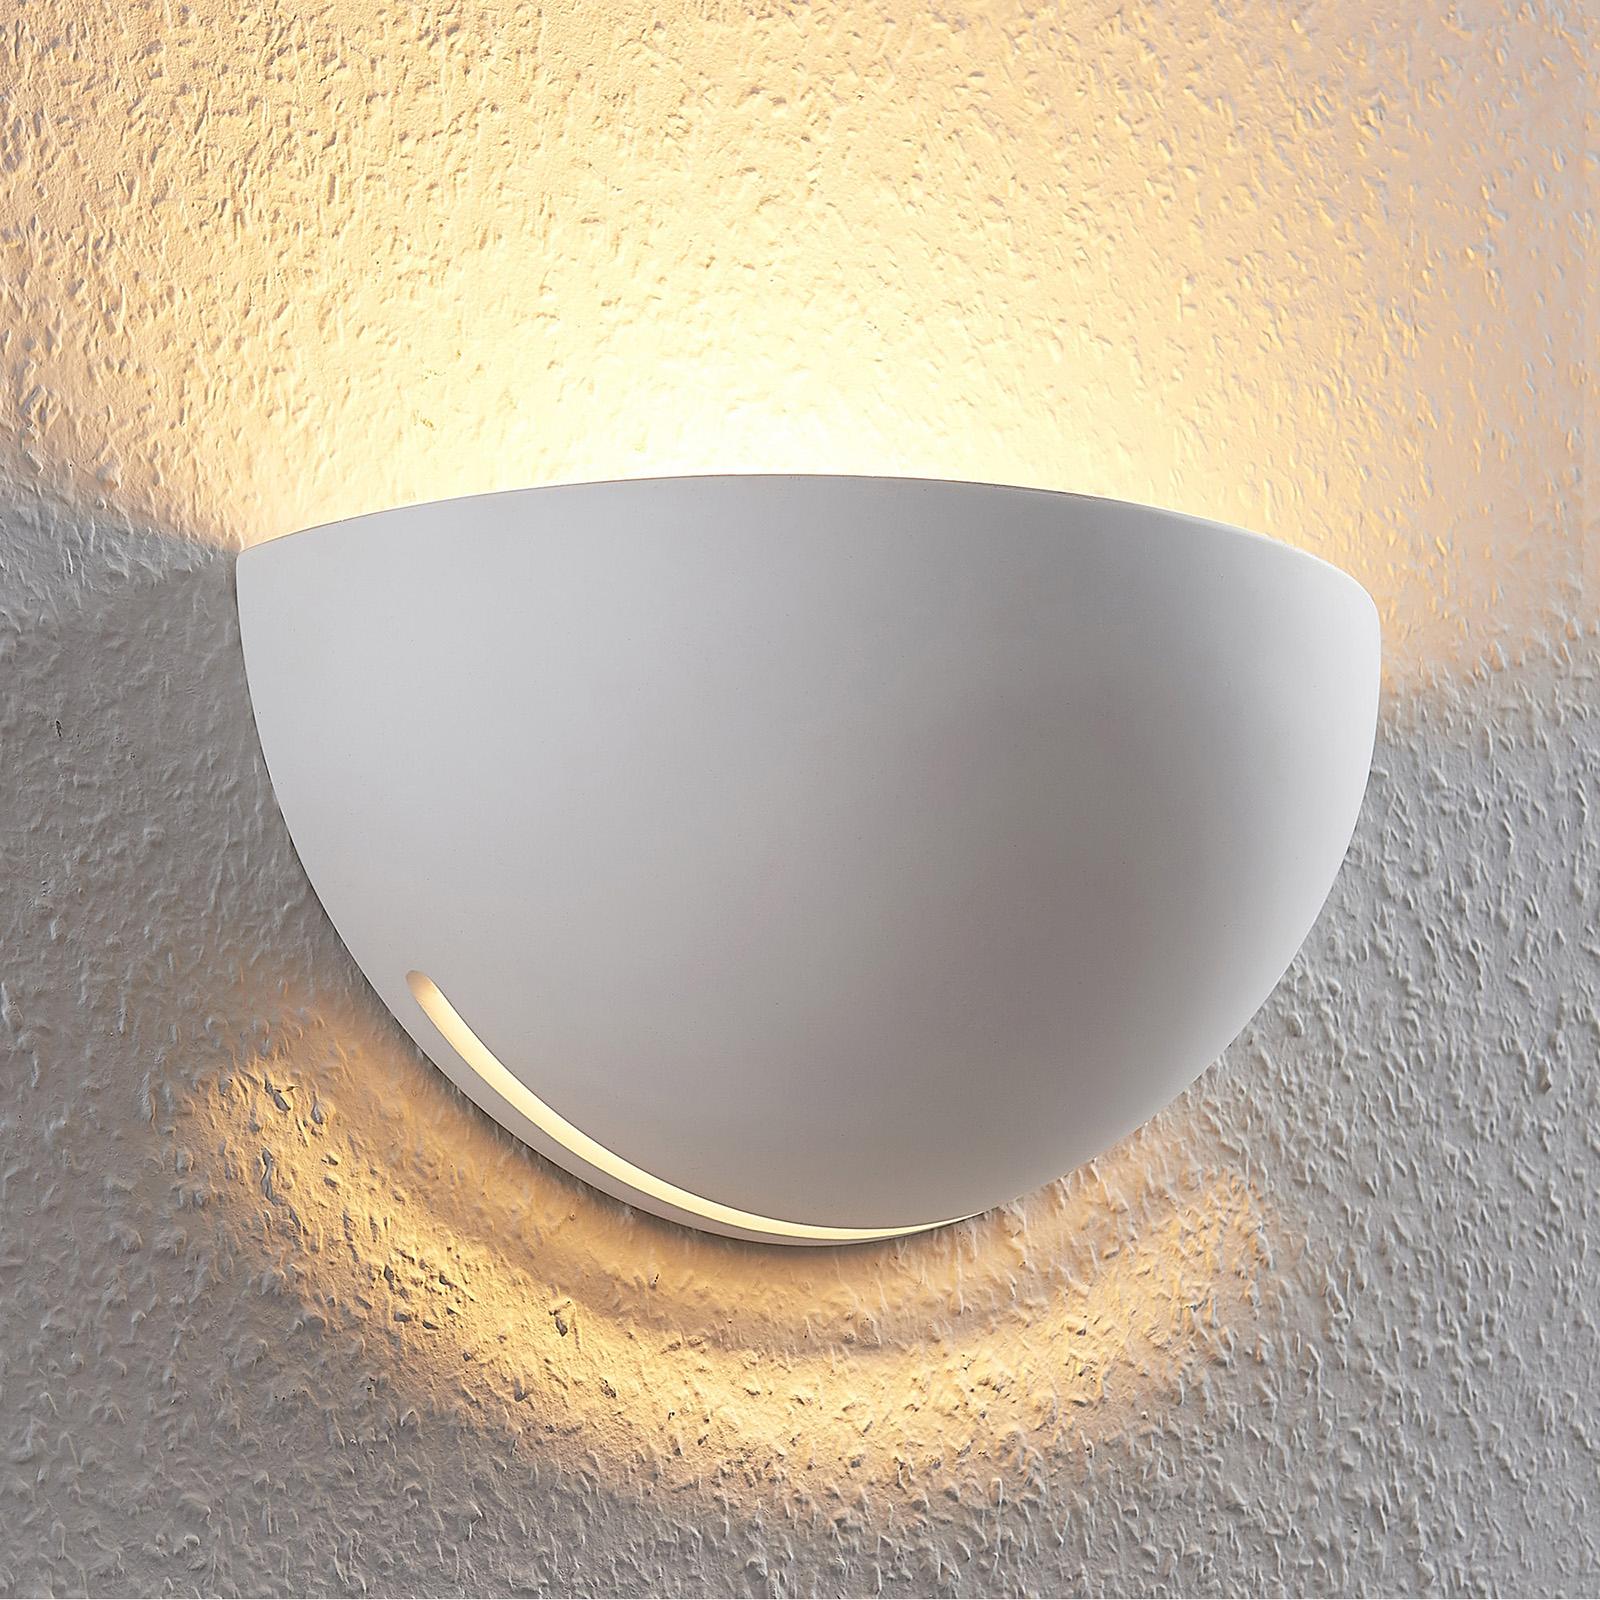 Sádrový nástěnný reflektor Jaron, bílý, půlkruhový